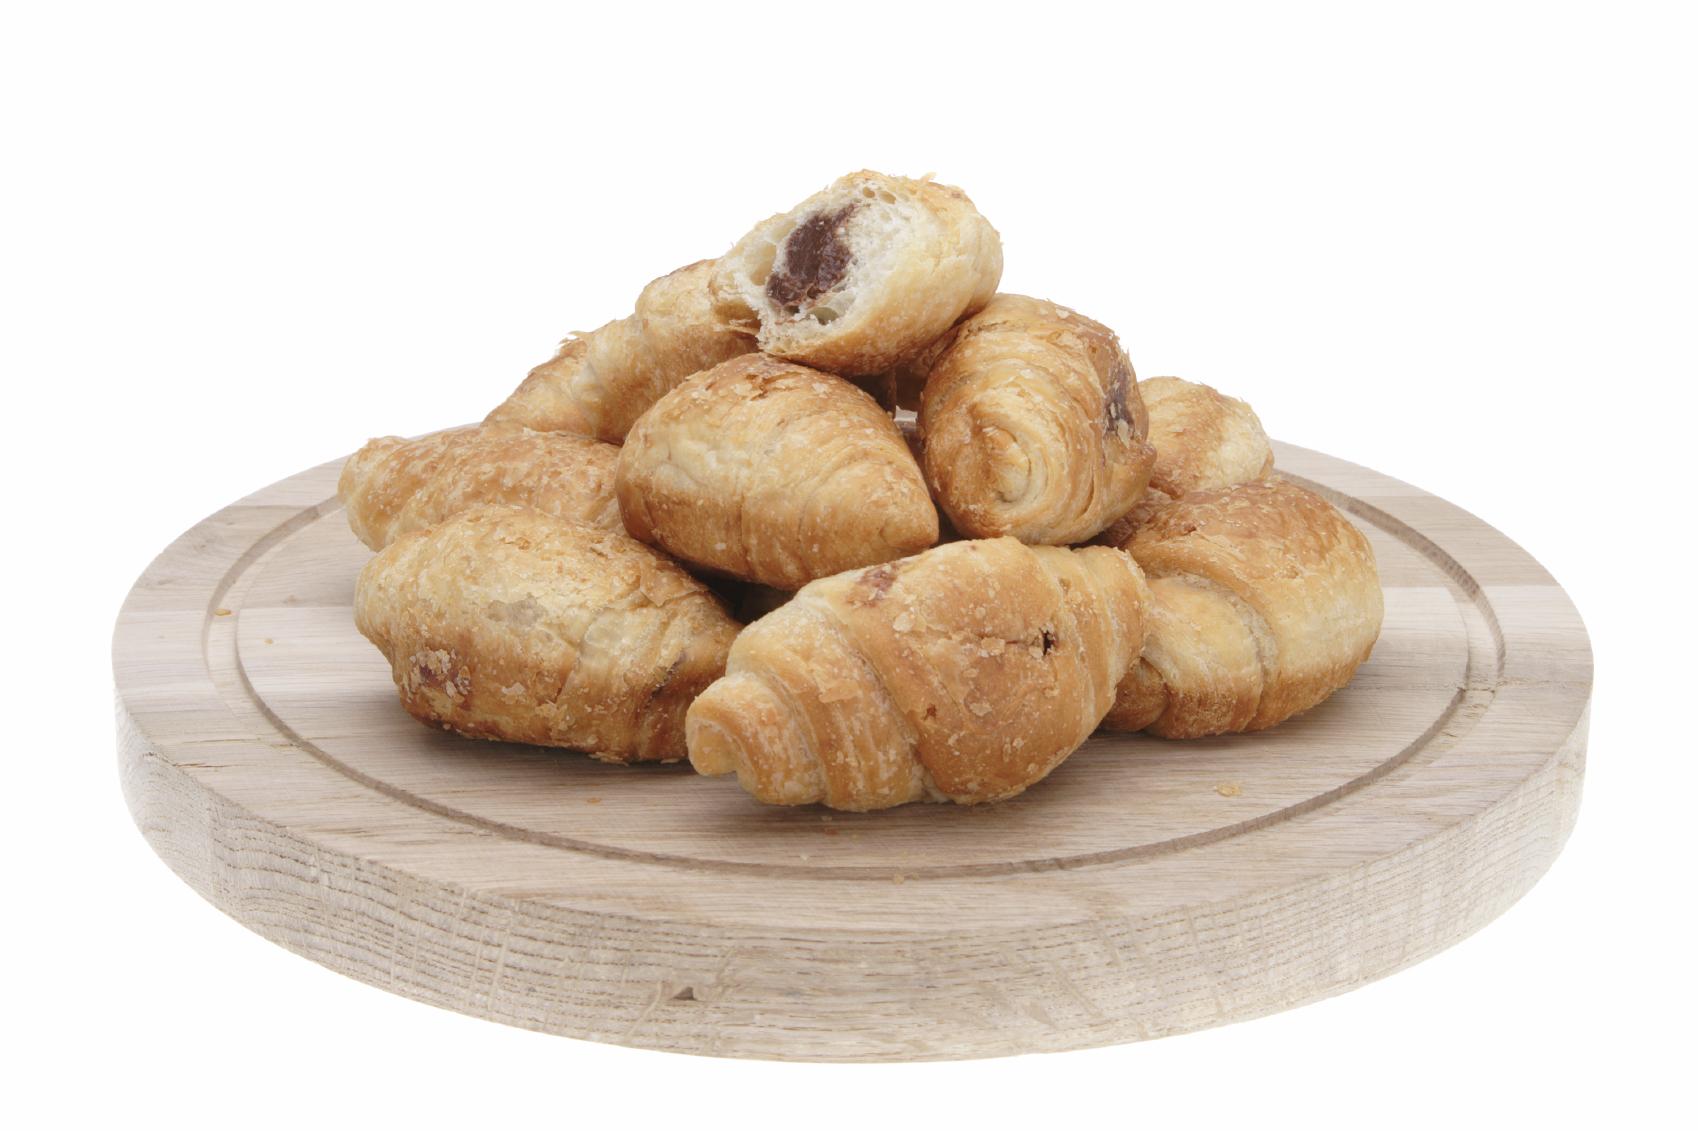 mini-croissants de hojaldre rellenos de chocolate a la taza